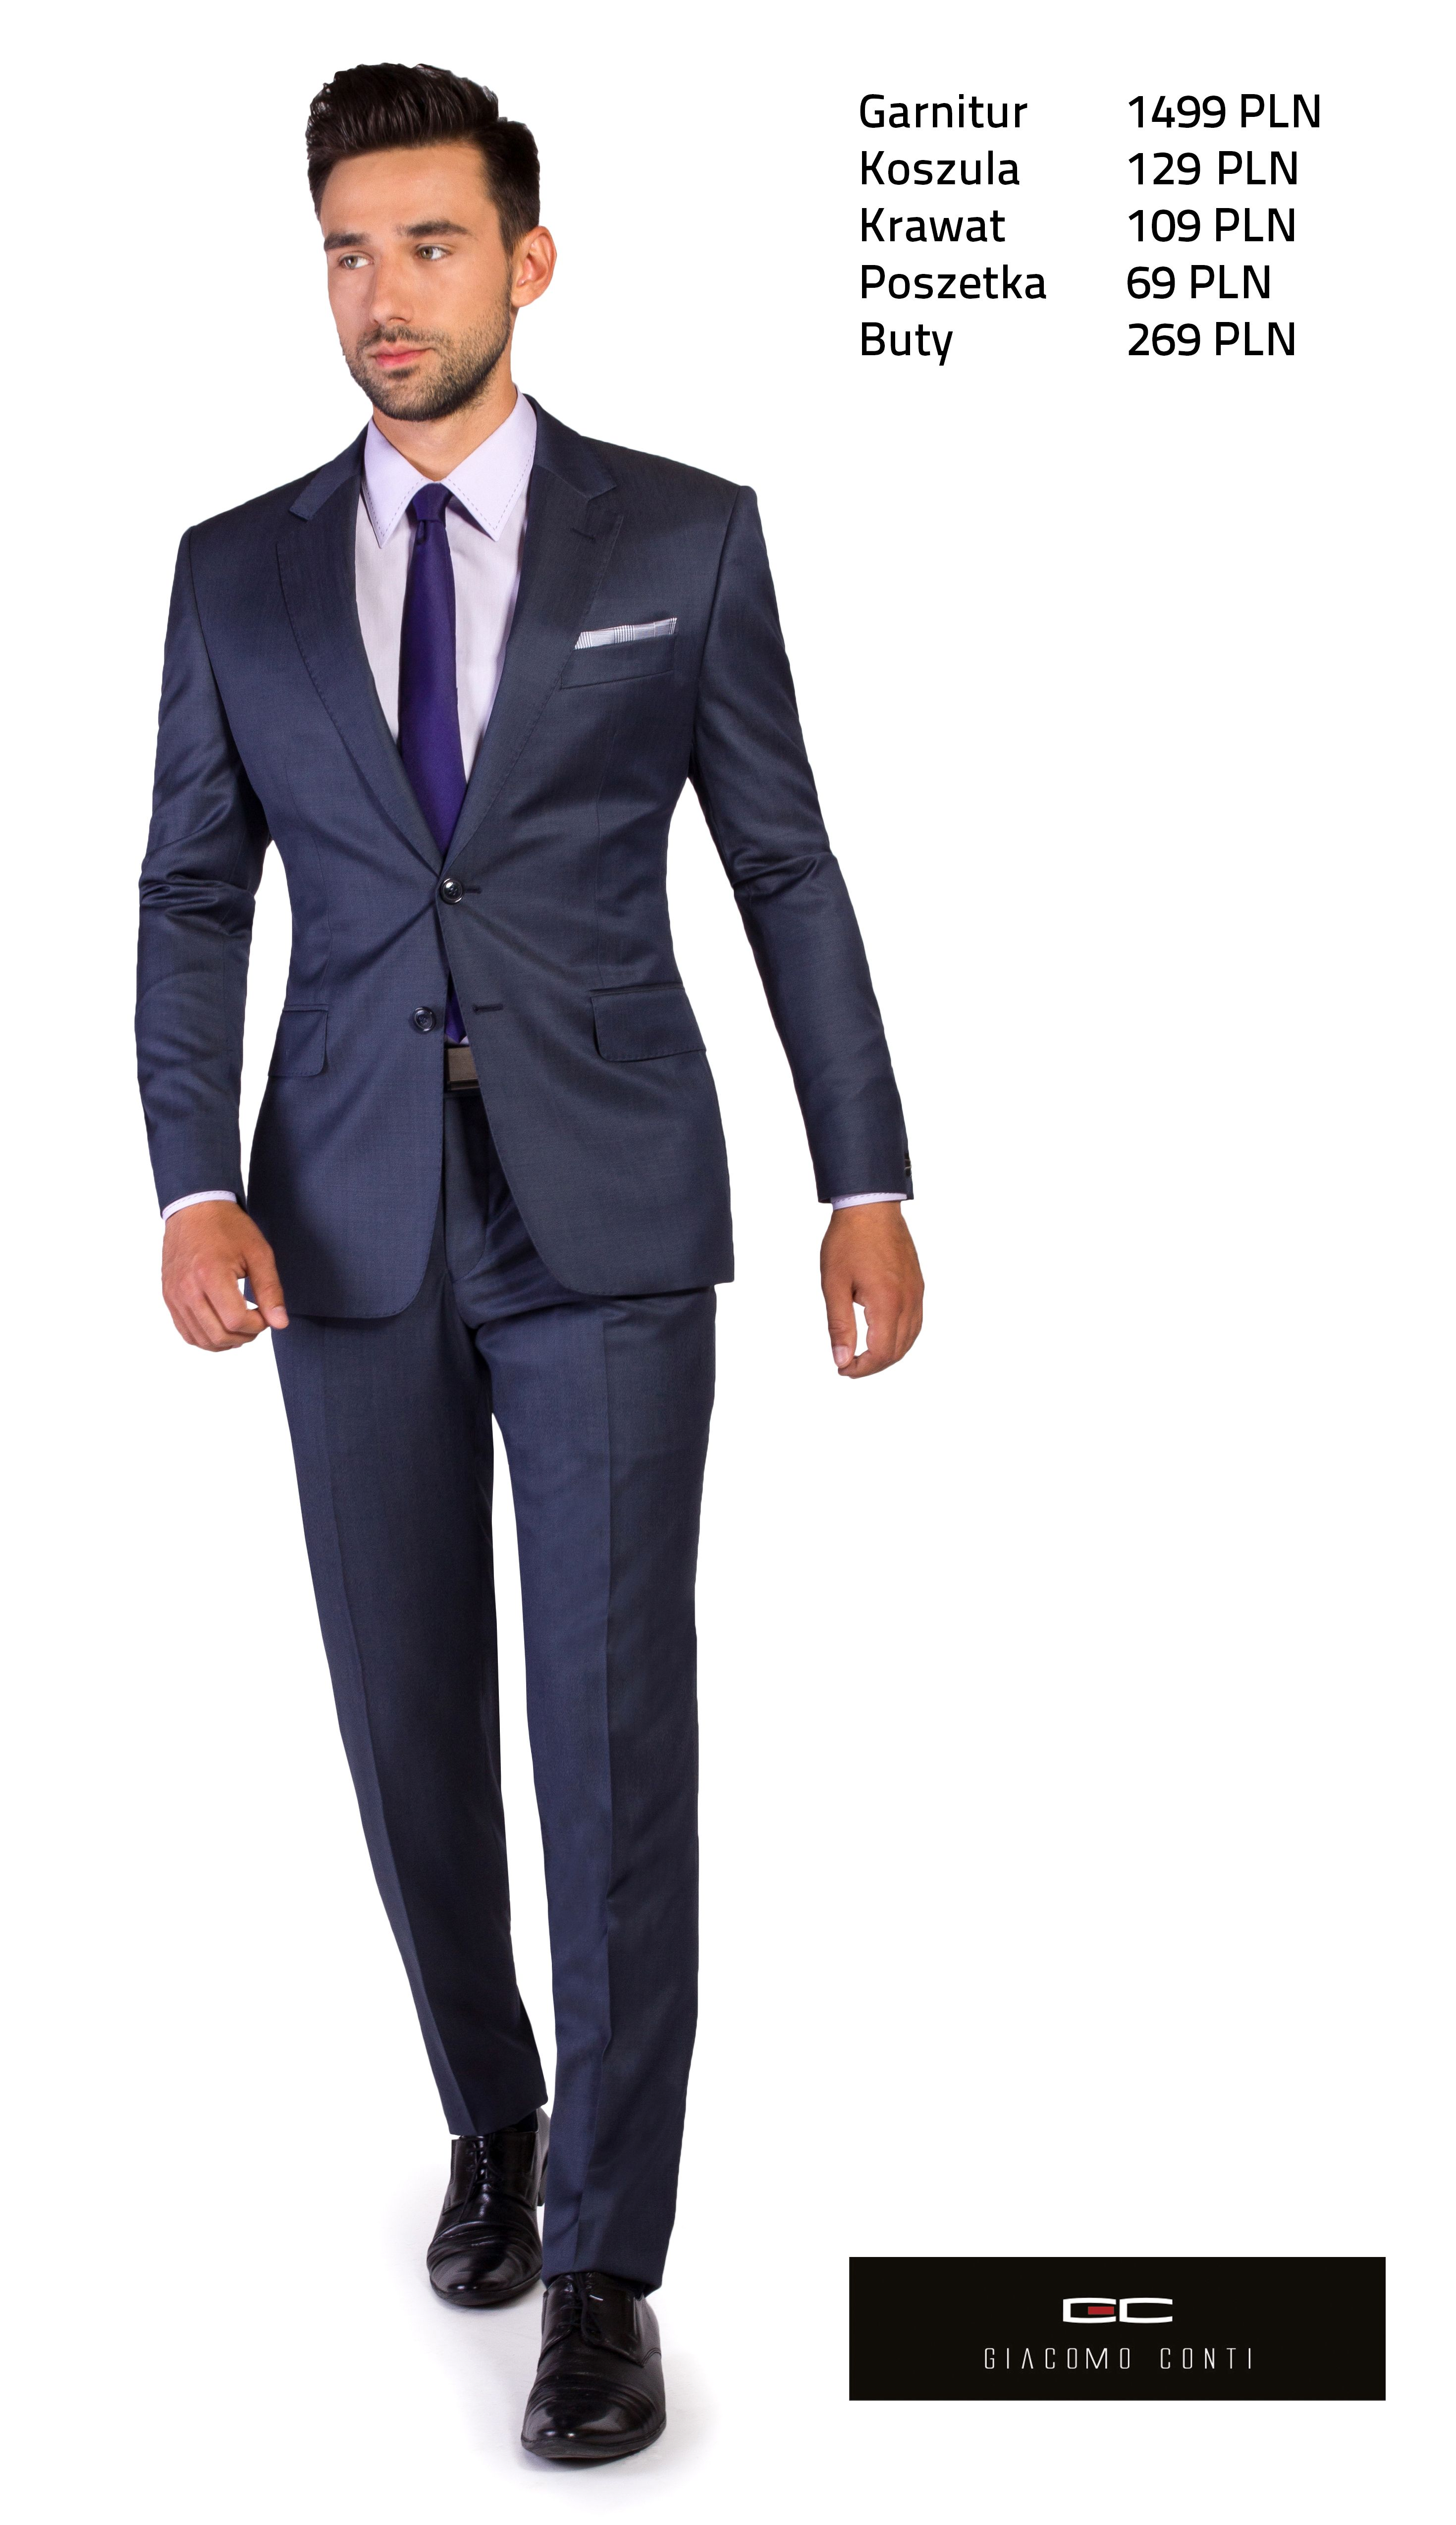 Propozycja Biznesowa Giacomo Conti Z Grafitowym Garniturem Carlo2 E13 21b Giacomoconti Mens Suits Suits Mens Fashion